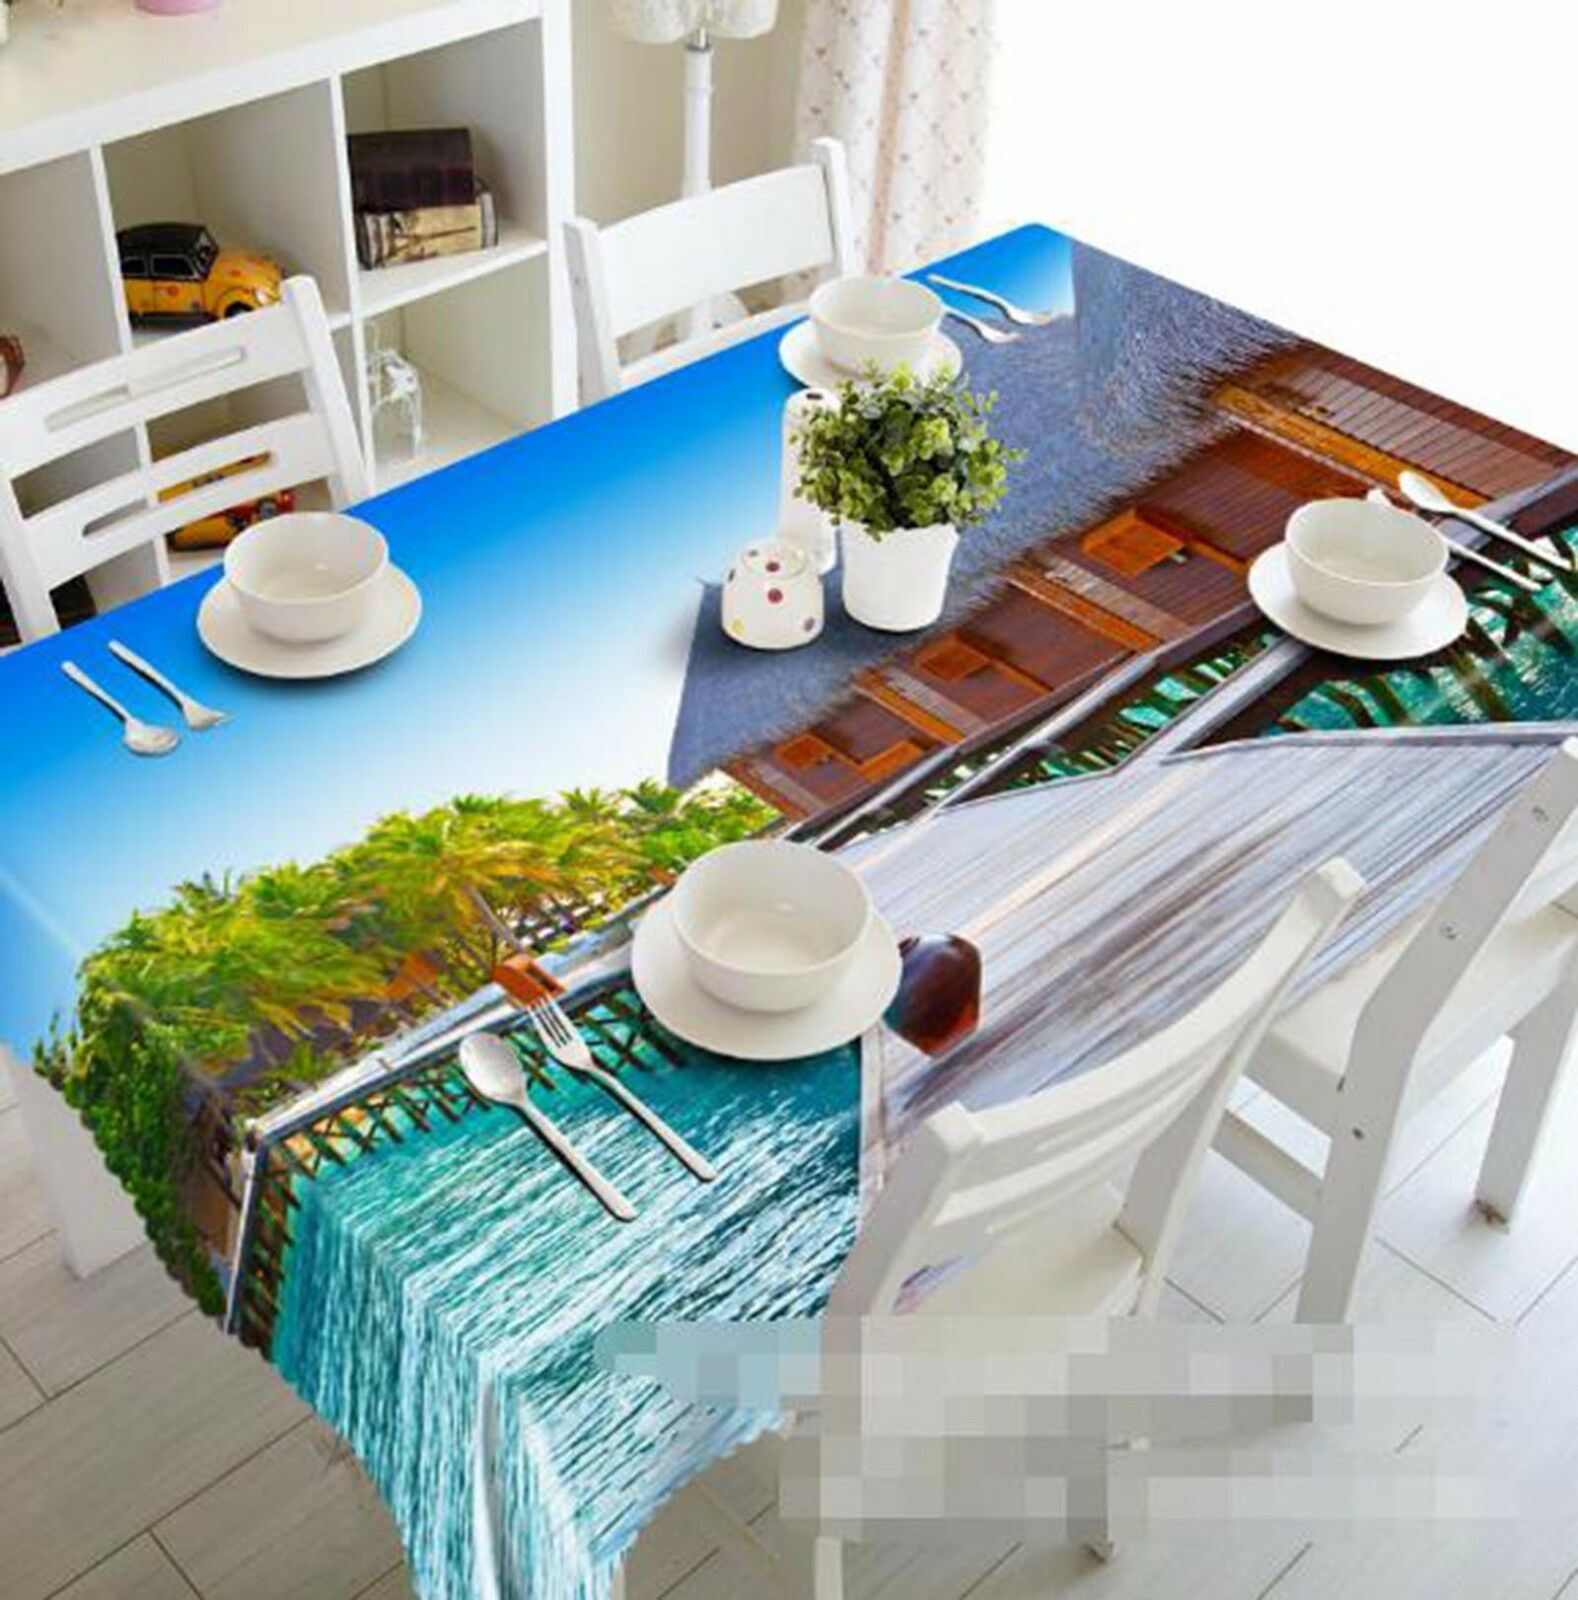 3D House Sea 6 Tablecloth Table Cover Cloth Birthday Party AJ WALLPAPER Lemon